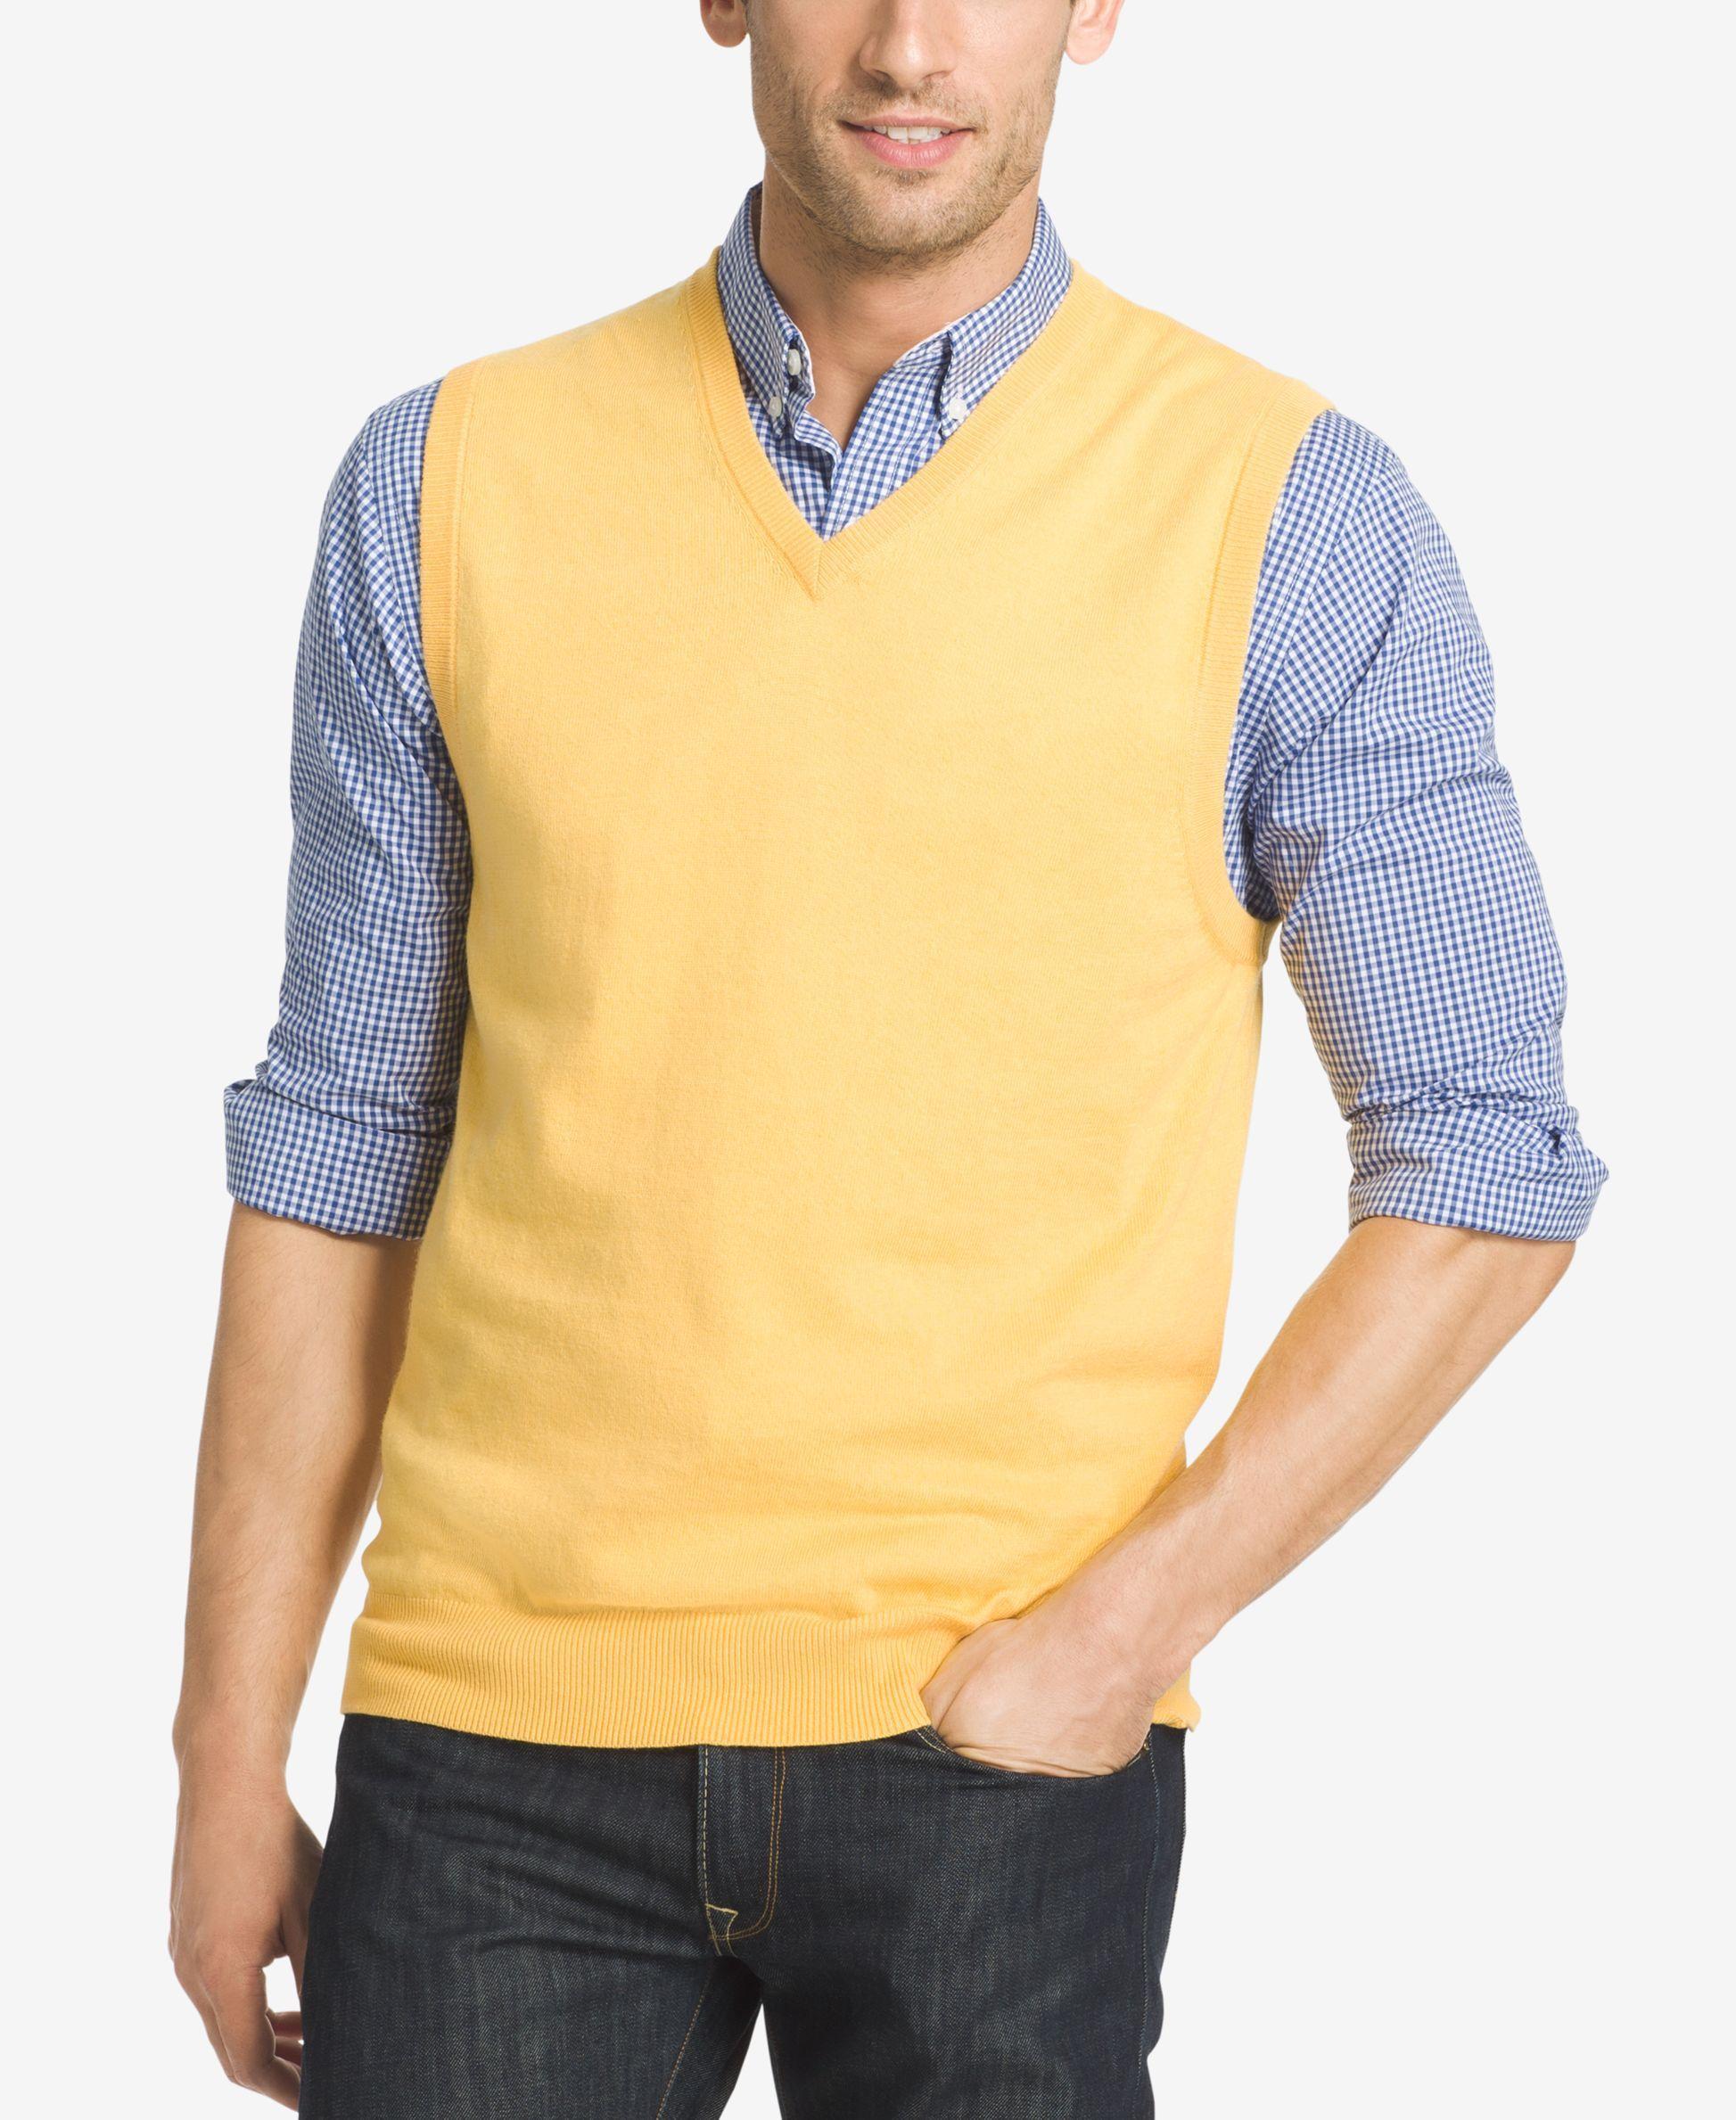 Izod Men's Campus Sweater Vest | Cardigans For Men | Pinterest